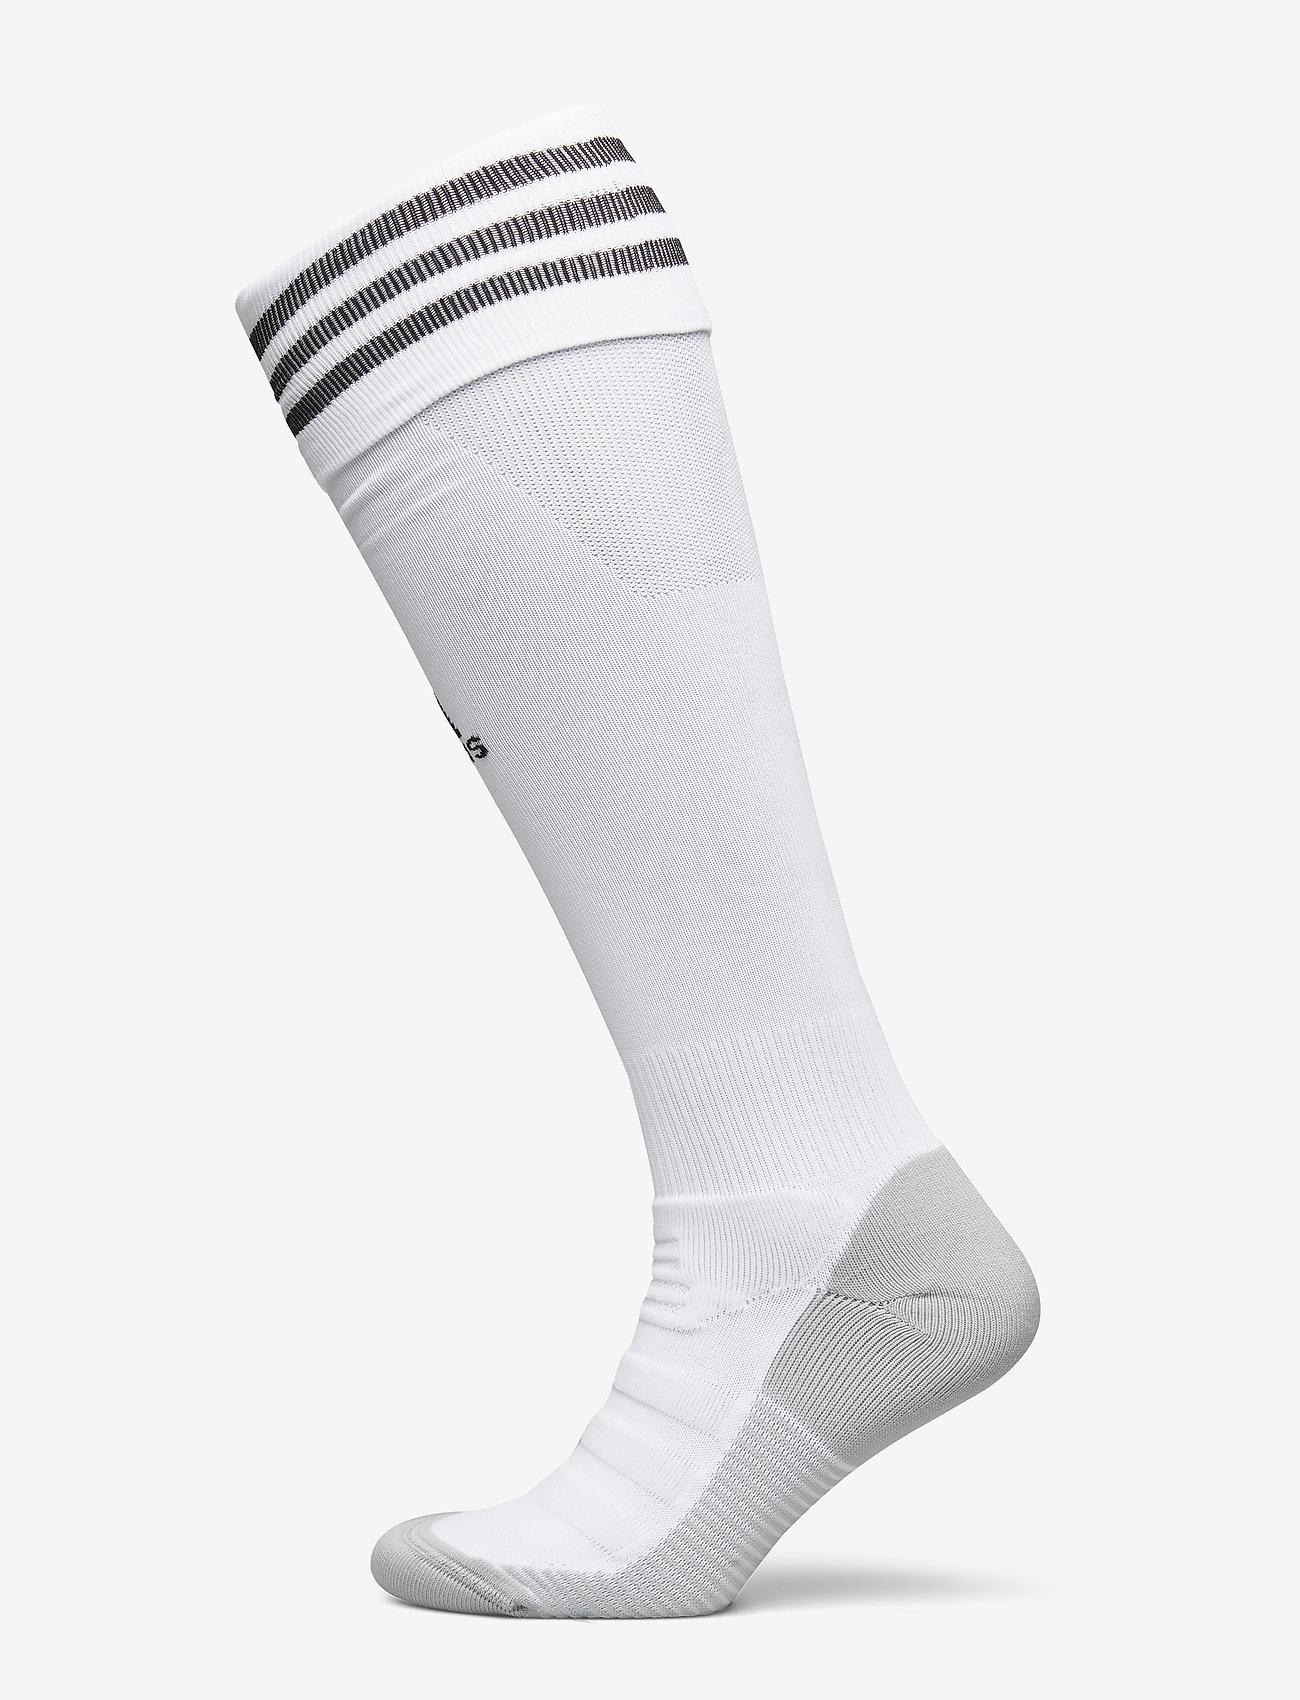 adidas Performance - ADI SOCK 18 - fußballsocken - white/black - 0